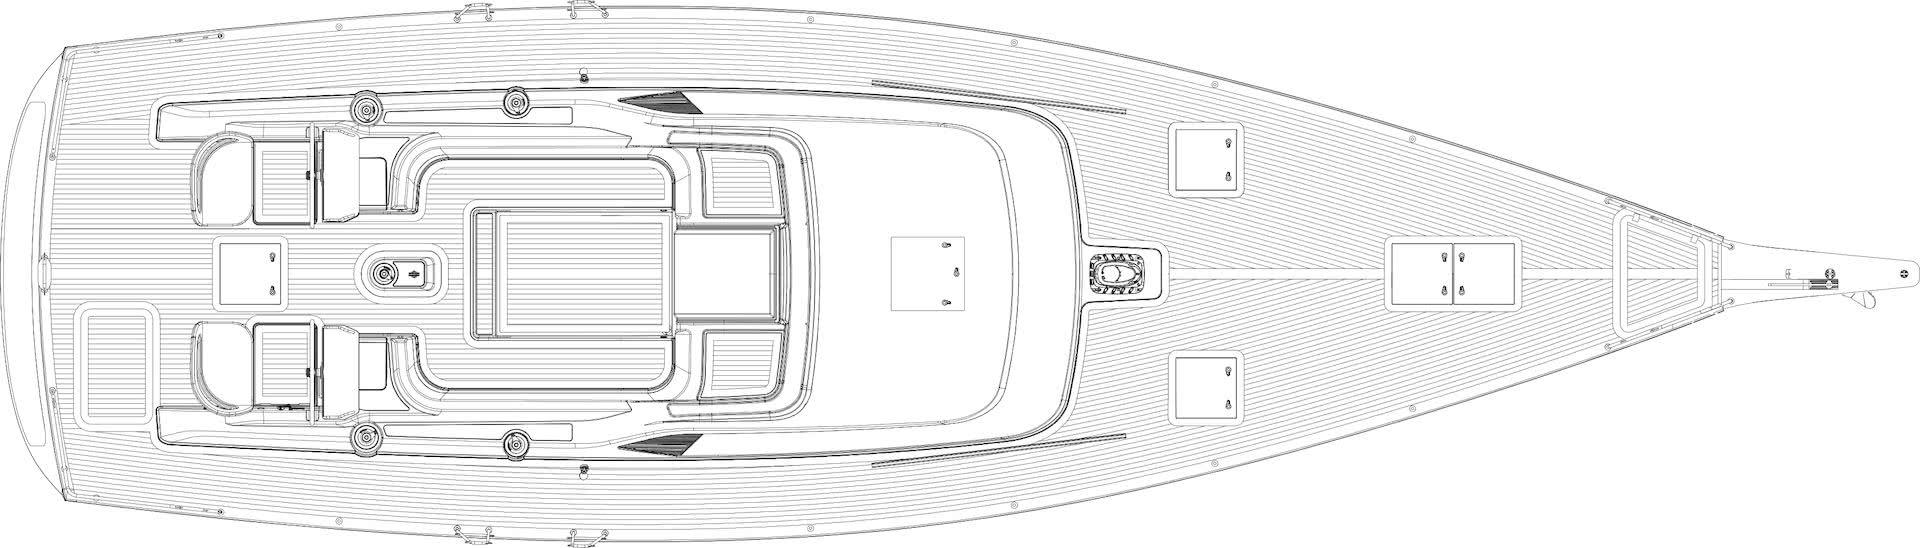 Deck Layout Contest 55 CS